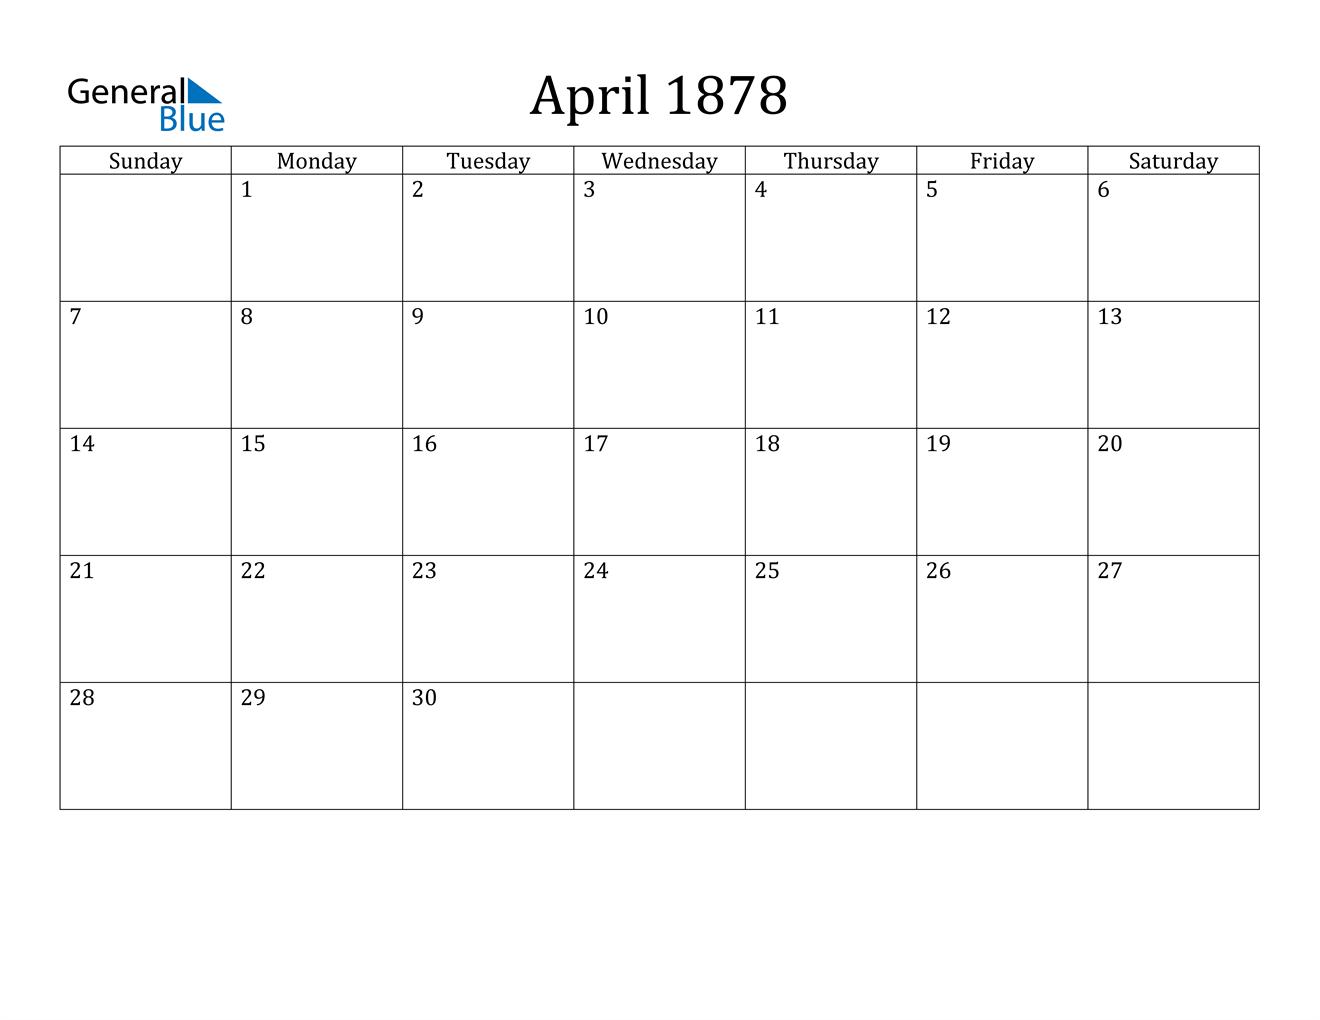 Image of April 1878 Classic Professional Calendar